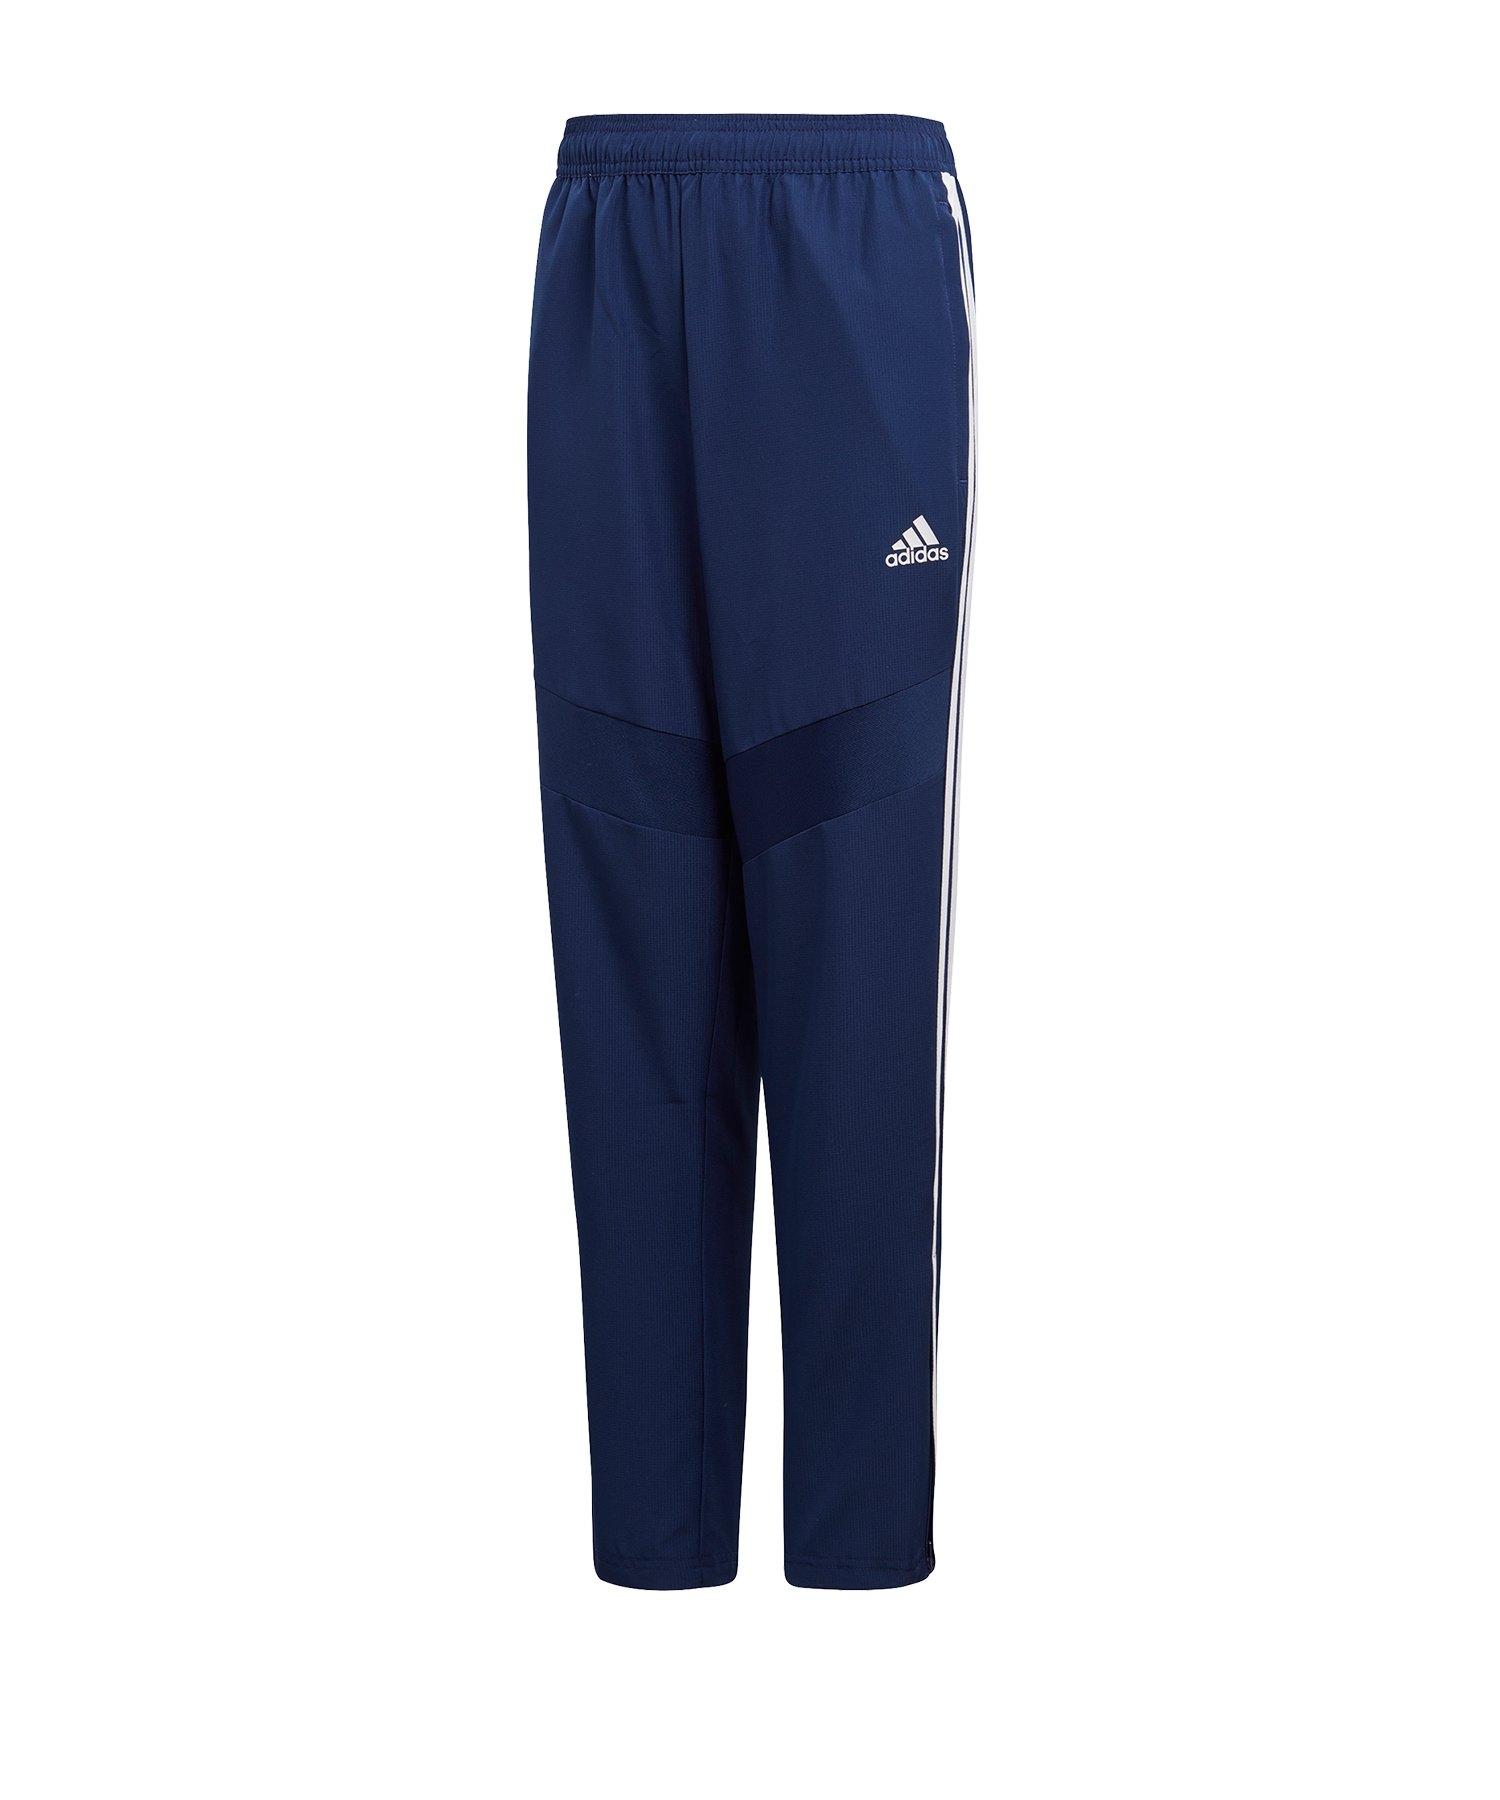 adidas Tiro 19 Woven Pant Kids Dunkelblau Weiss - blau